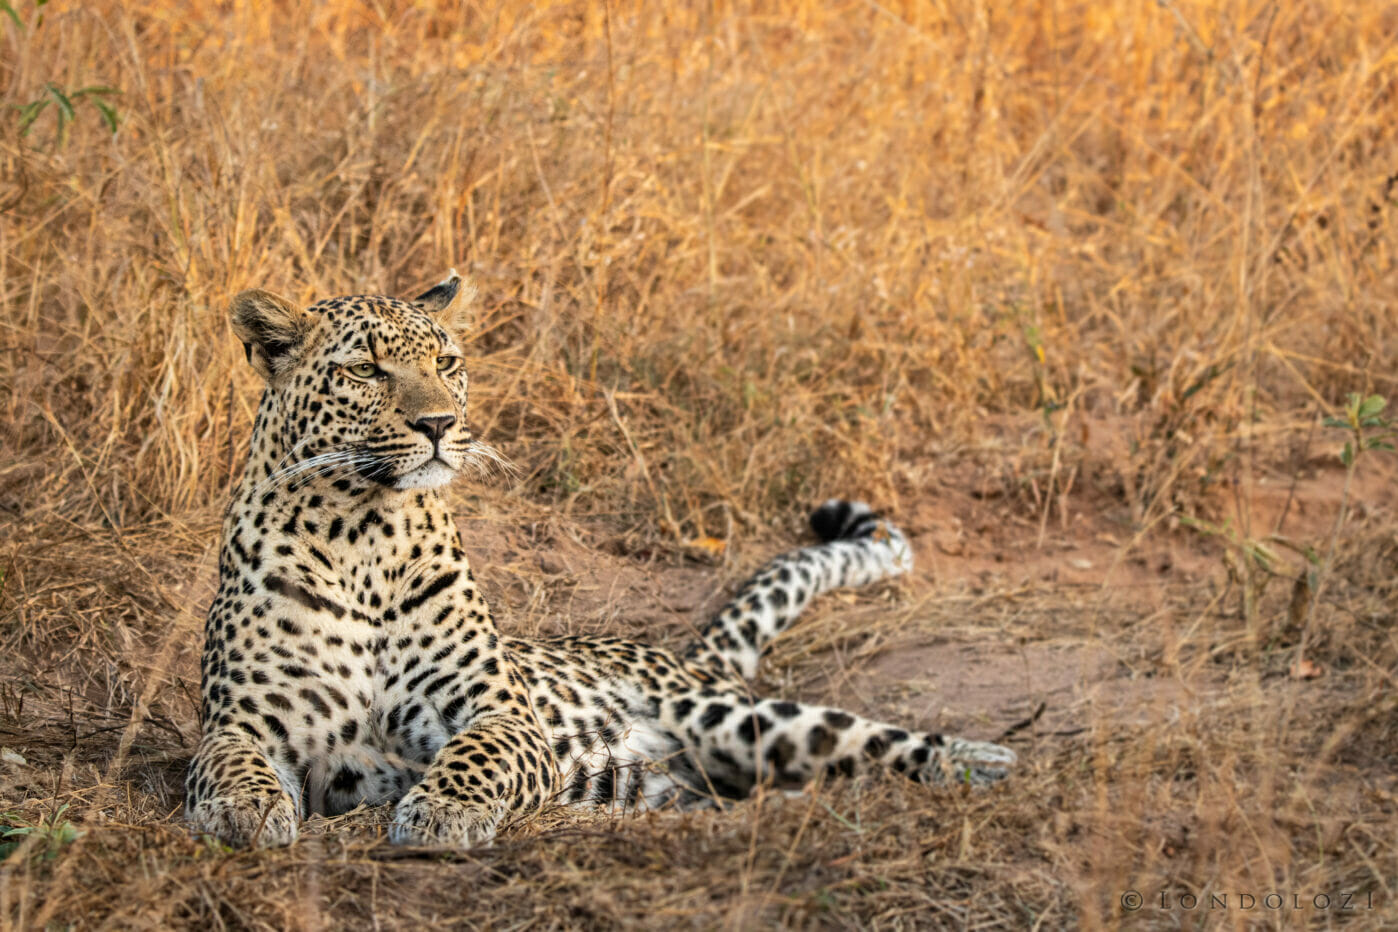 CT Xinzele Female Leopard, June 2021